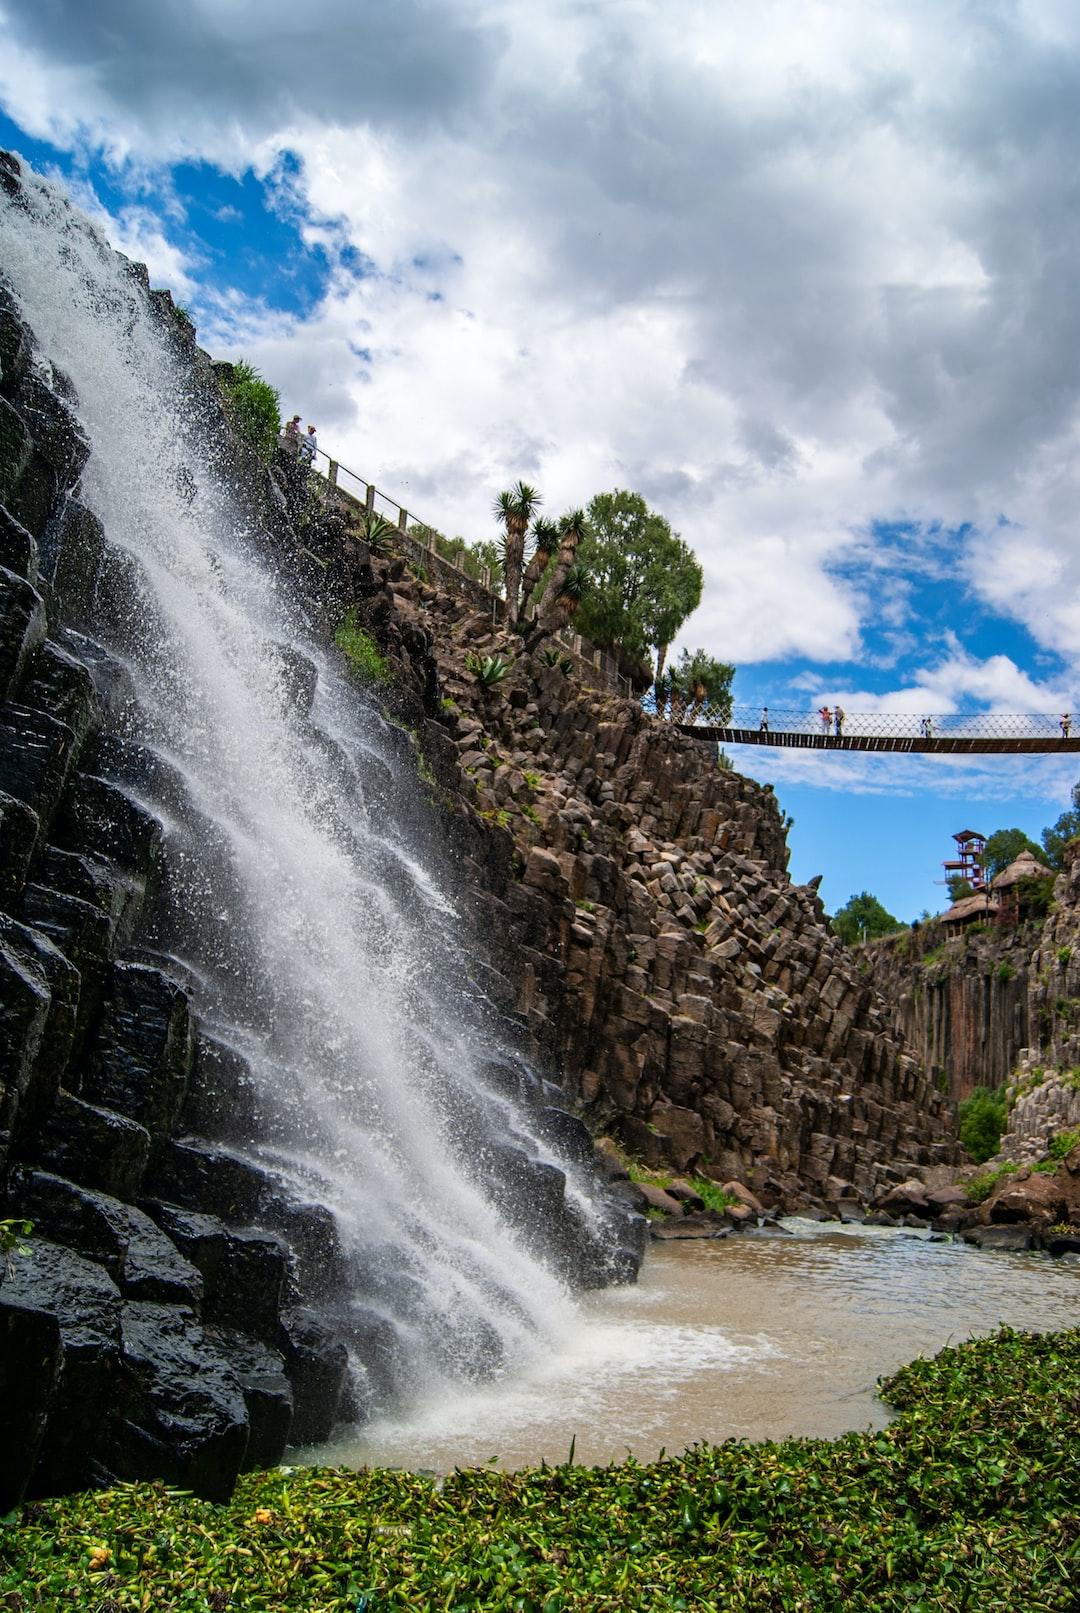 Los Prismas, Huasca de Ocampo, Hidalgo, México. 2019. Photo: David Montelongo